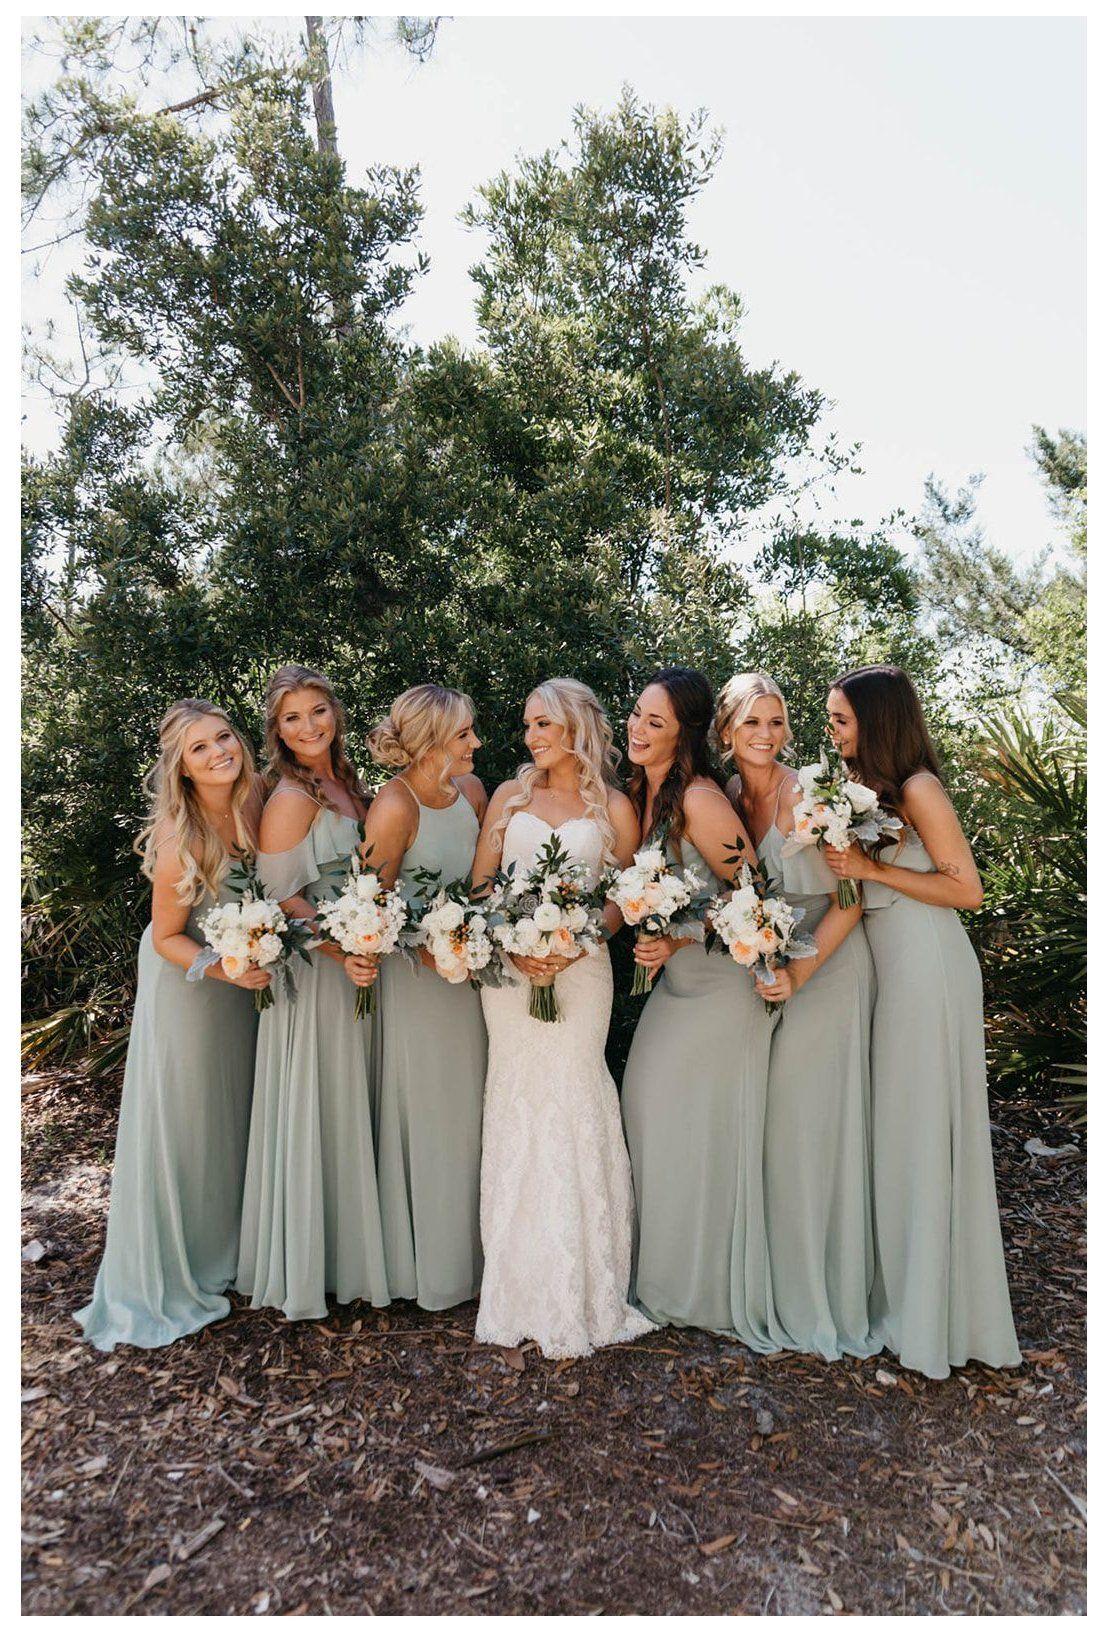 Spring Green Bridesmaid Dresses